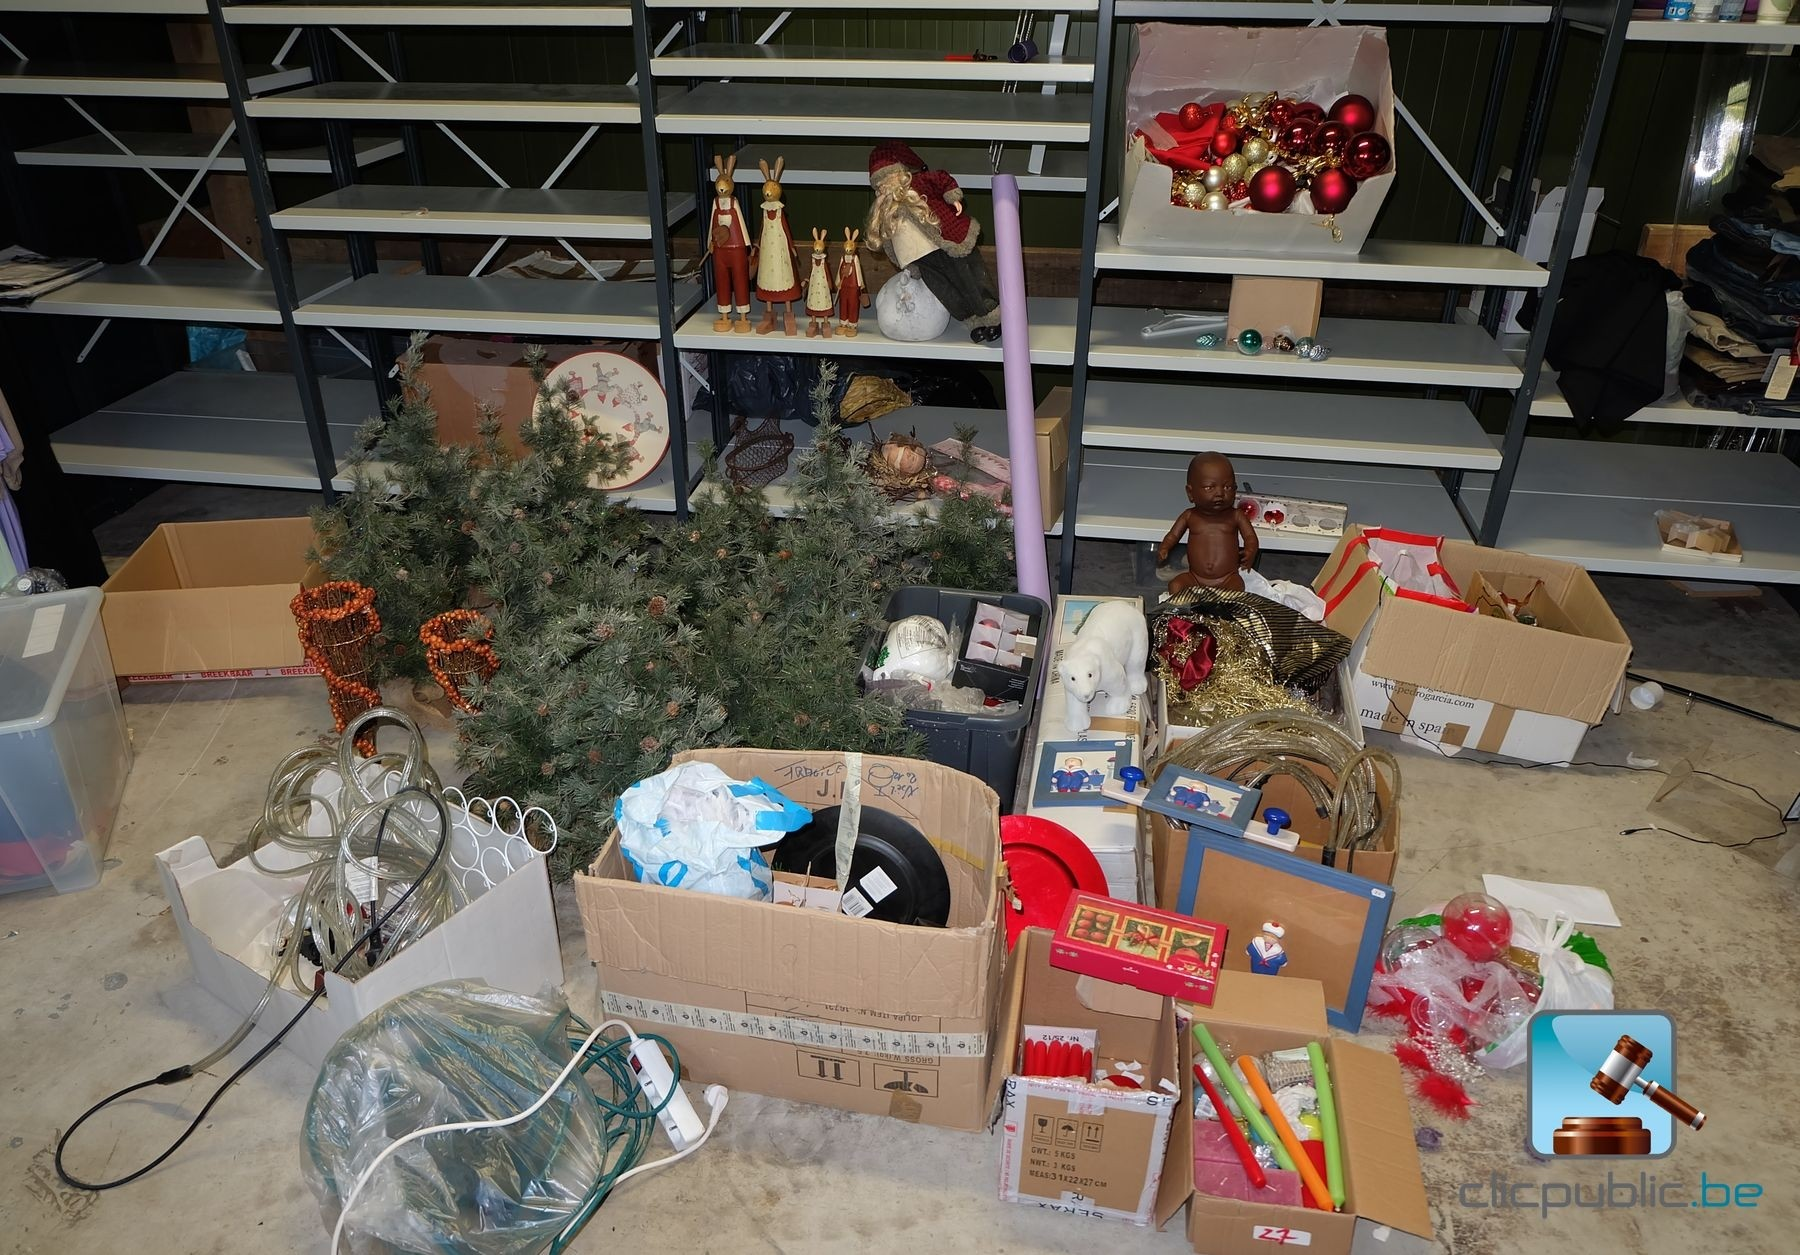 #B31825 Décorations De Noël (ref. 27) à Vendre Sur Clicpublic.be 5319 decorations de noel a vendre 1800x1255 px @ aertt.com